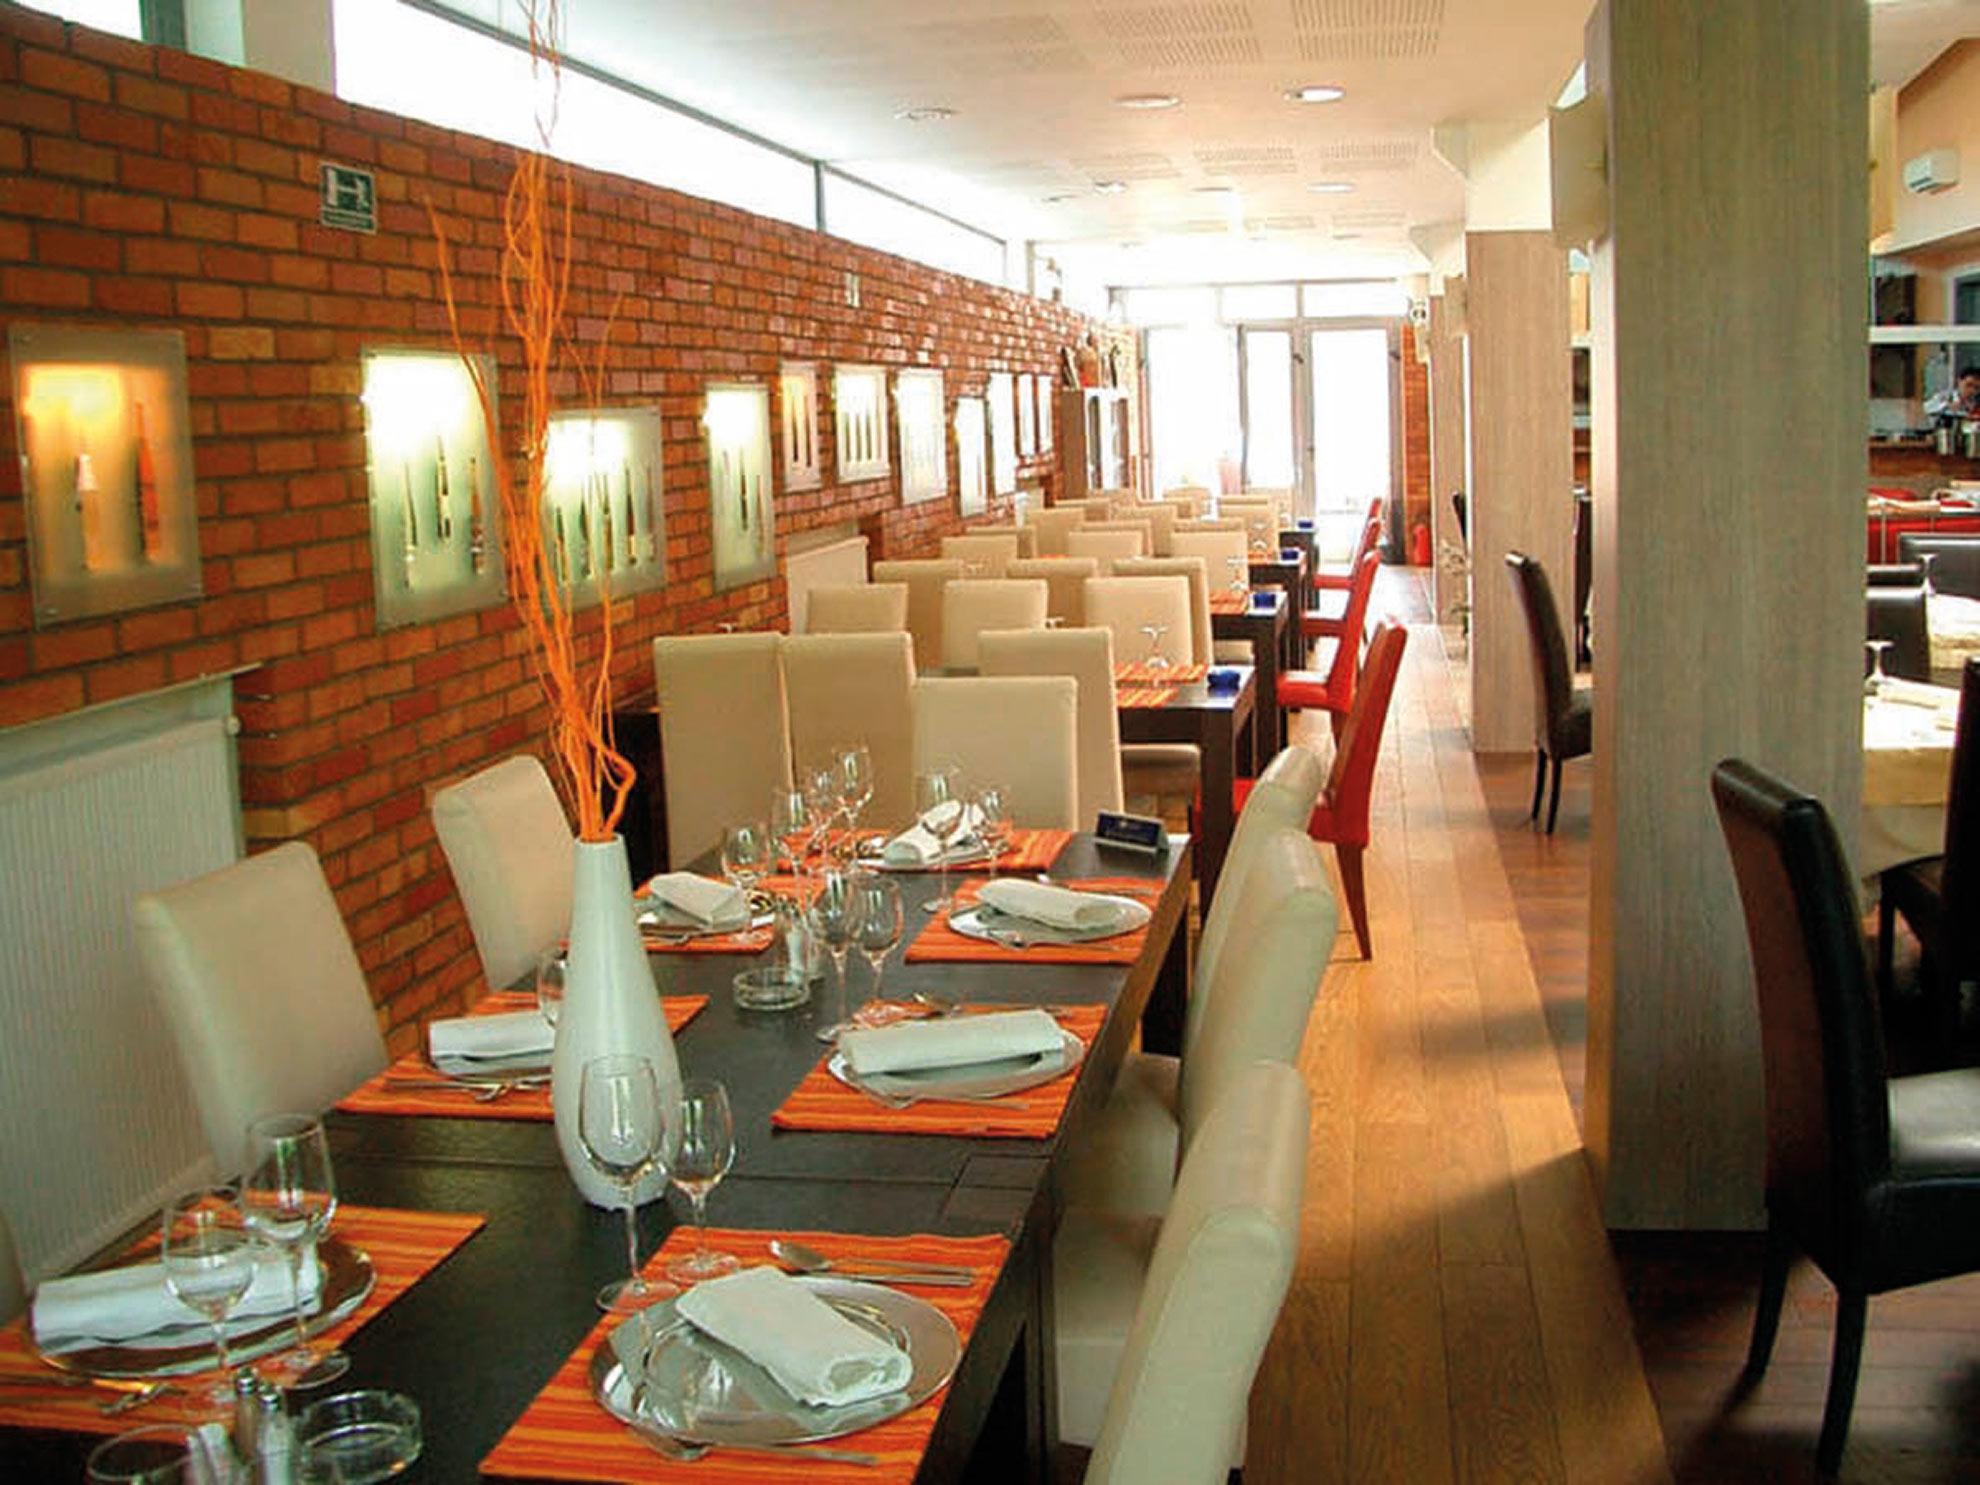 Restoran COCKTAIL, Sisak - Gastronaut restorani  Flambiranje